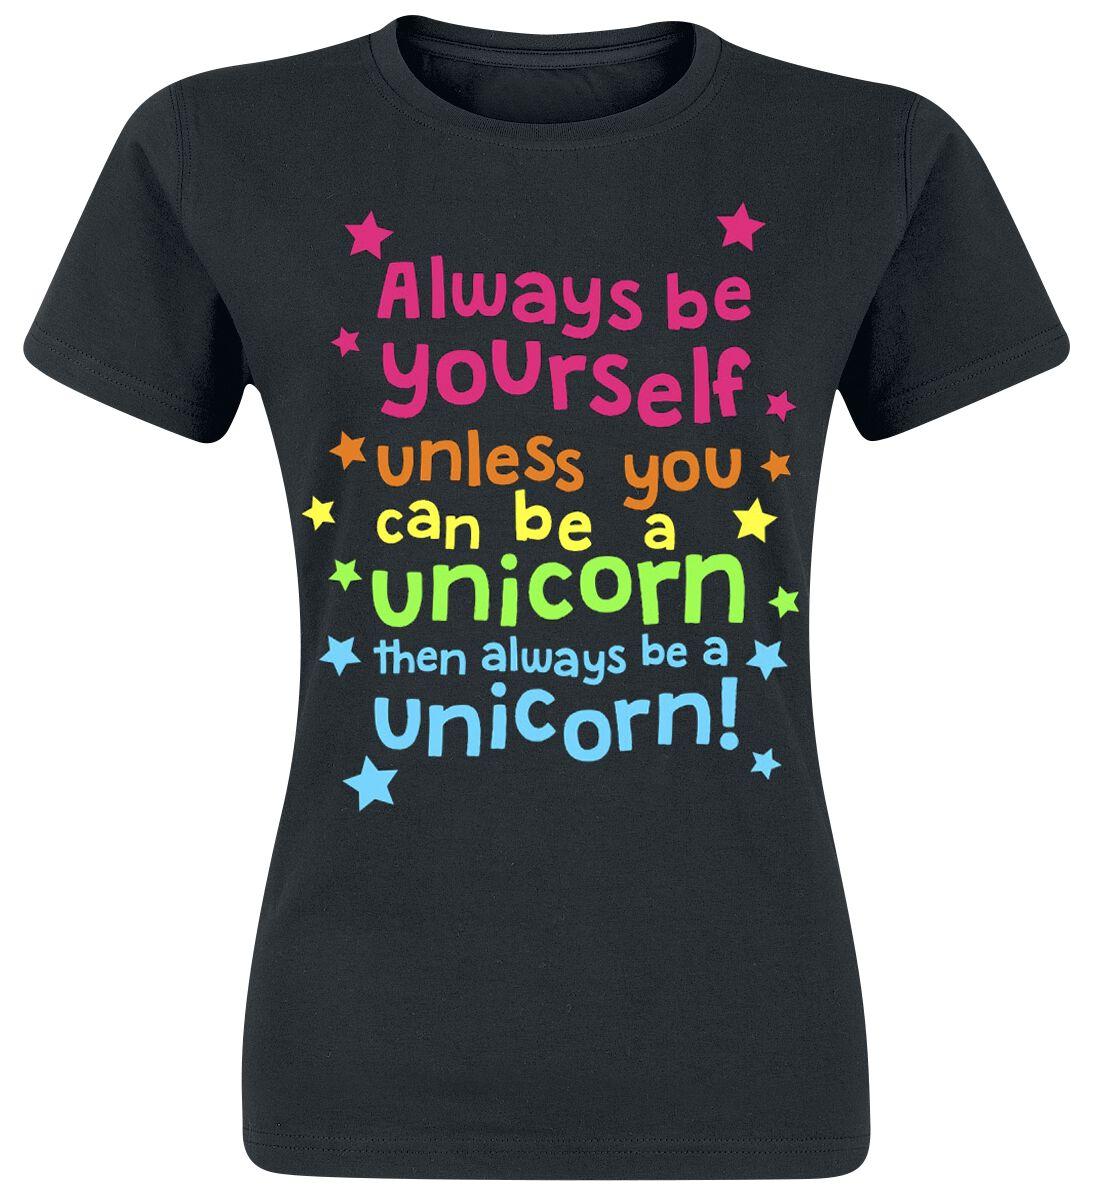 Fun Shirts - Koszulki - Koszulka damska Always Be Yourself Koszulka damska czarny - 293078